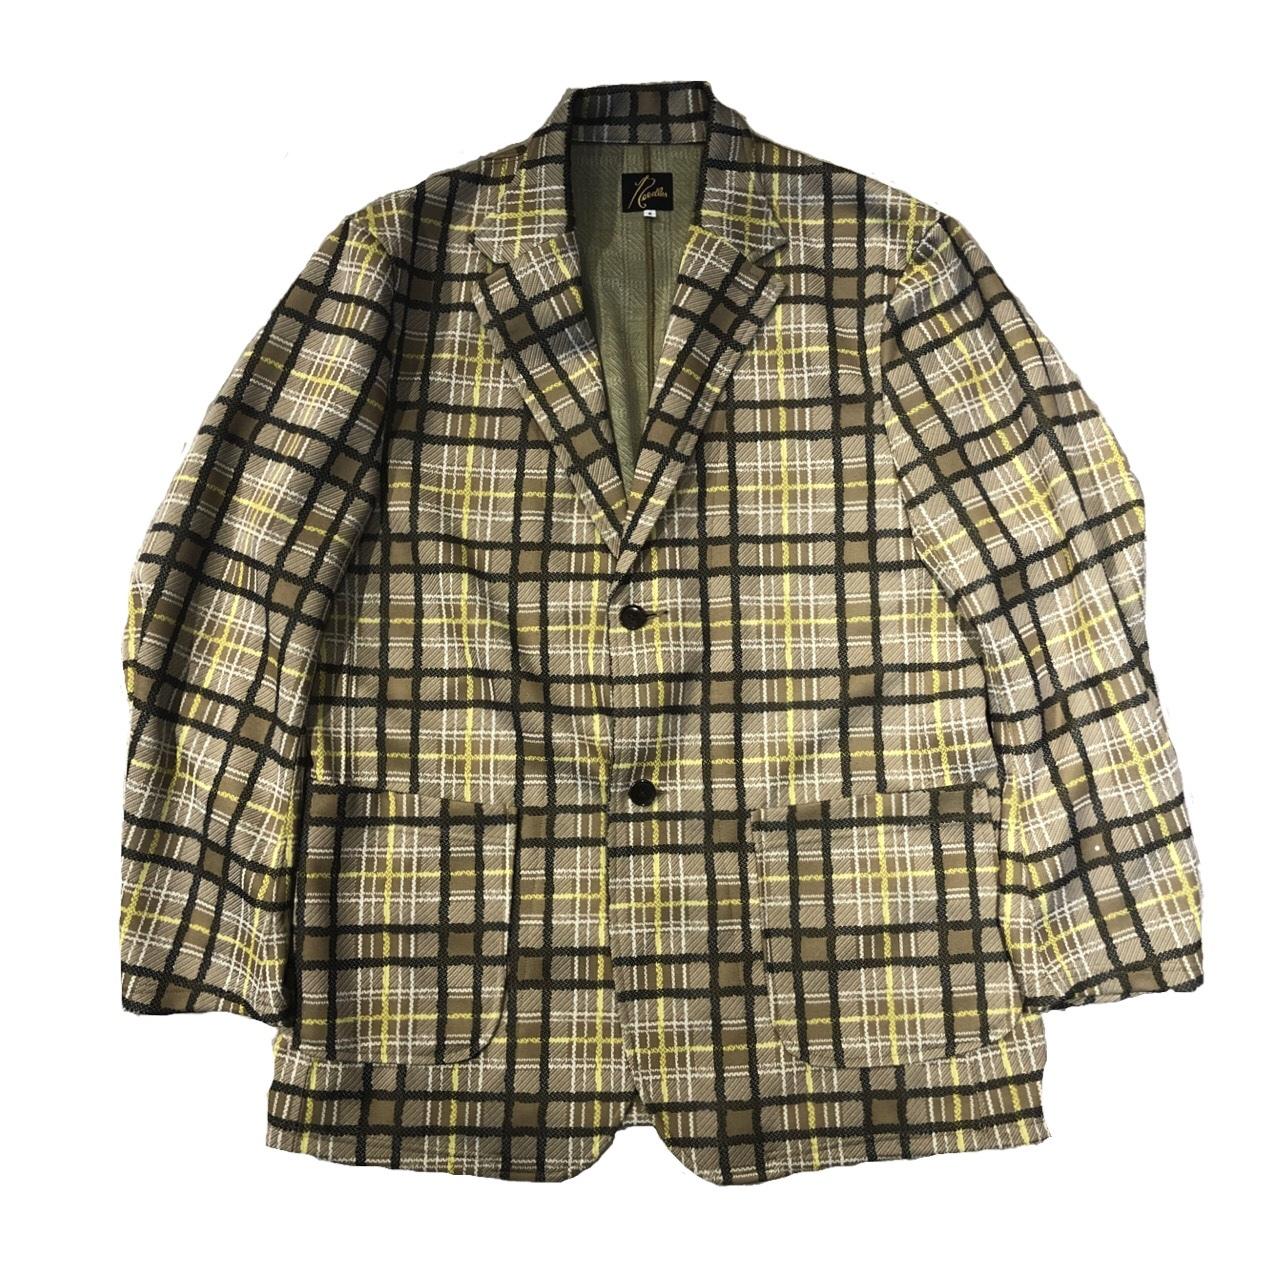 NEEDLES Jersey Jacket Check